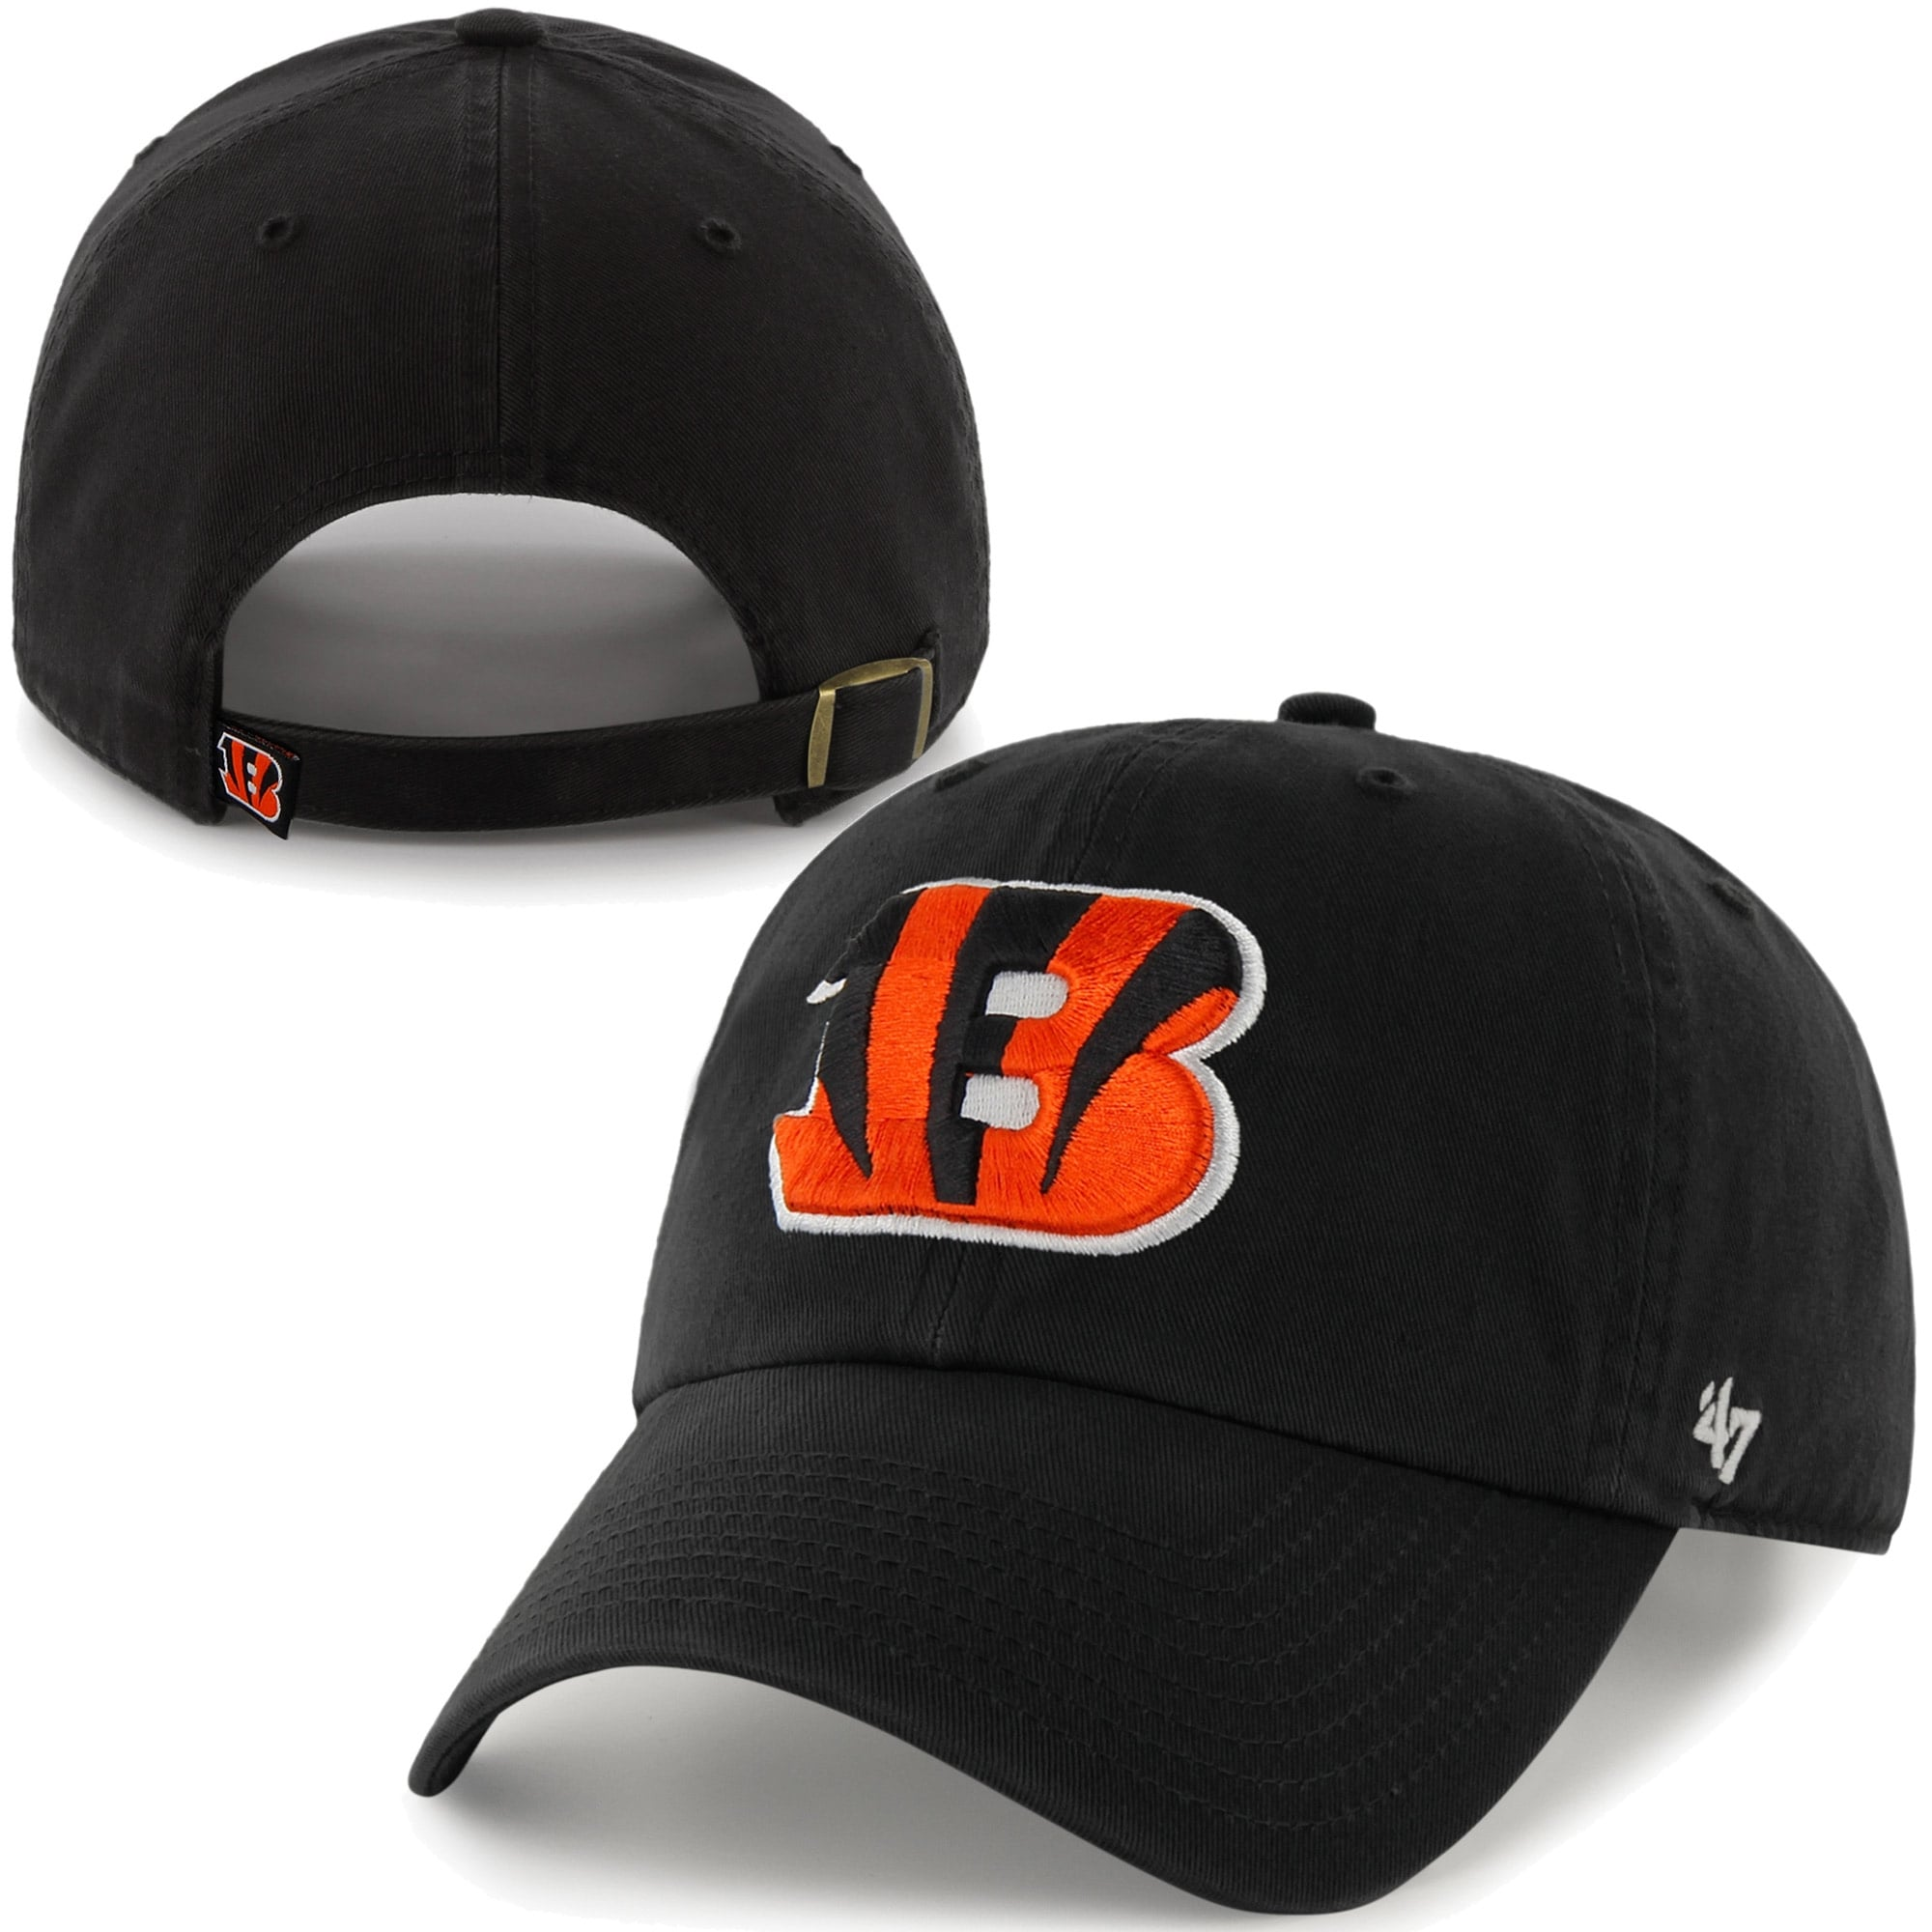 Cincinnati Bengals '47 Brand Cleanup Adjustable Hat - Black